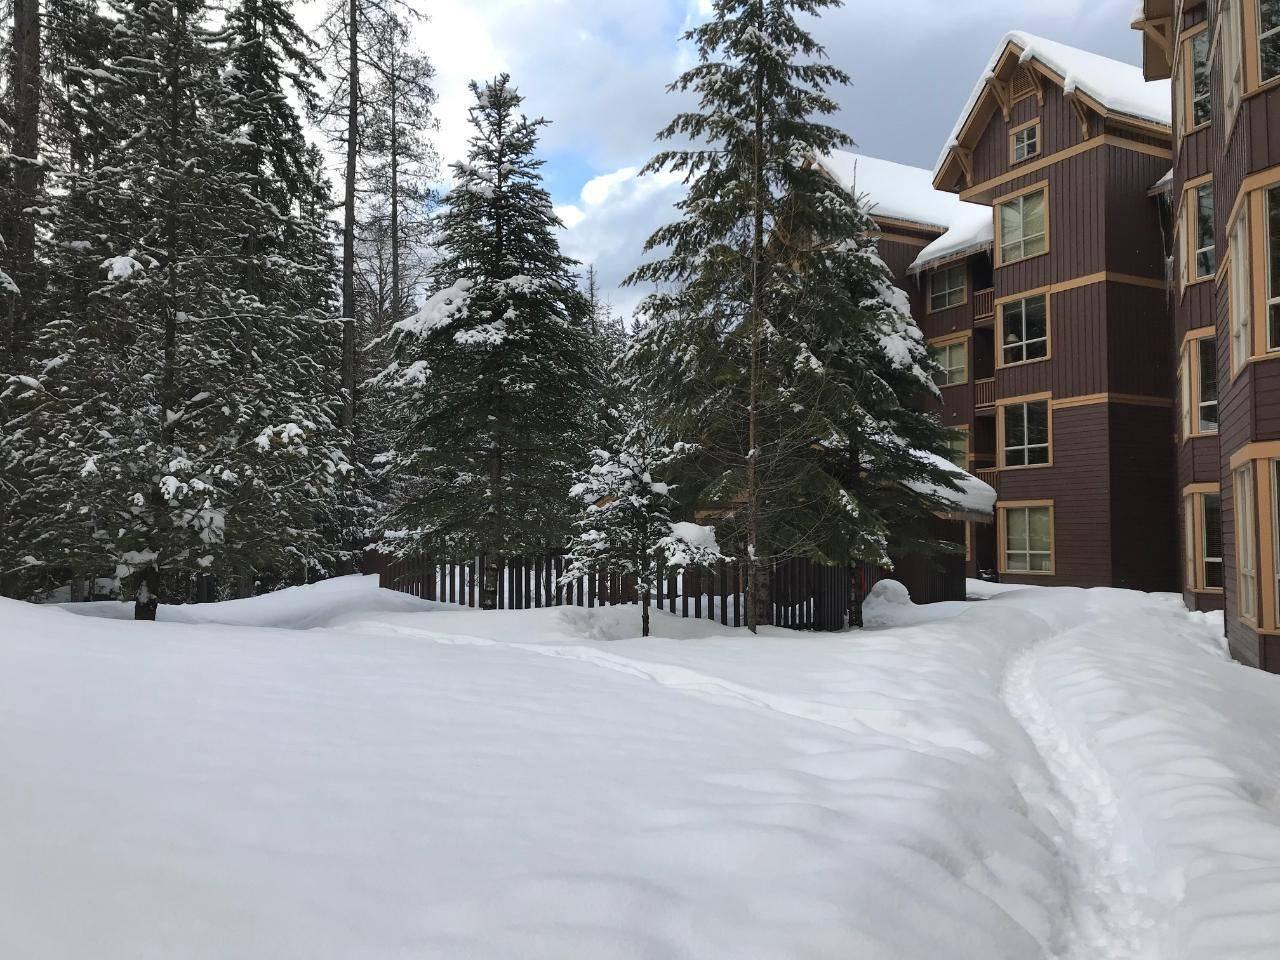 618c - 4559 Timberline Cres. Crescent , Ski Hill Area | Image 2